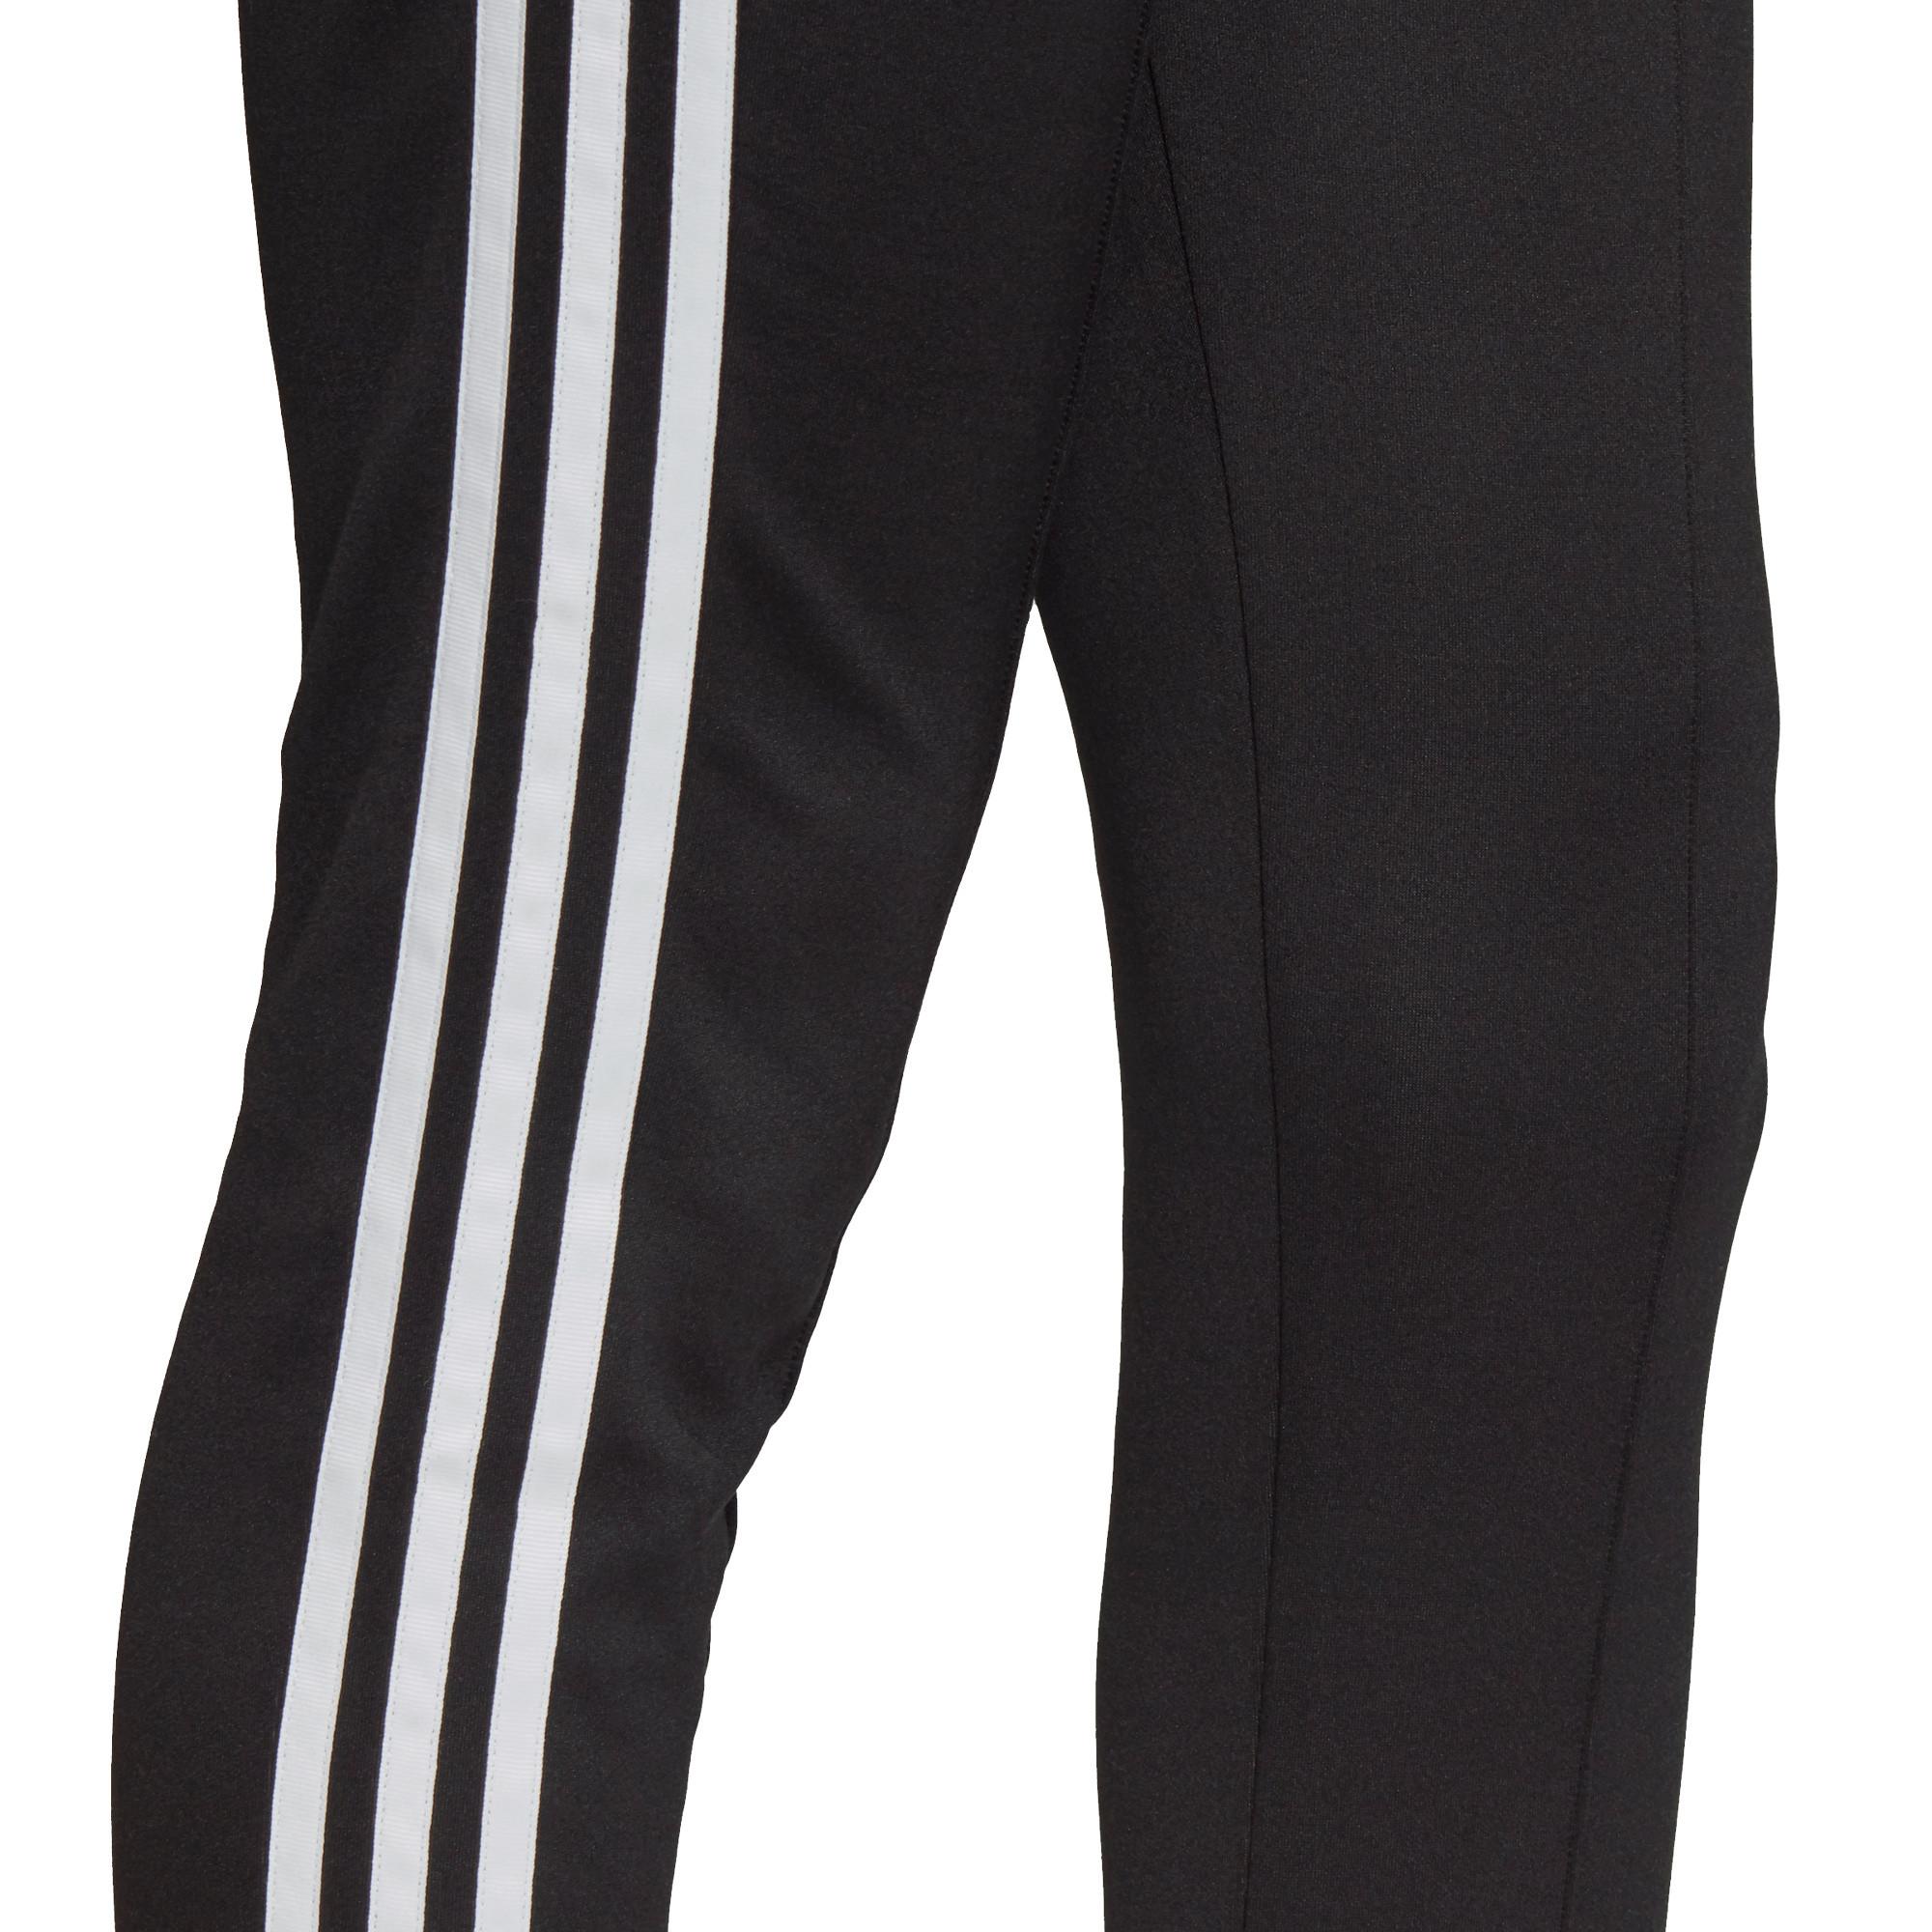 Pantaloni tuta Primeblue SST, Bianco/Nero, large image number 9